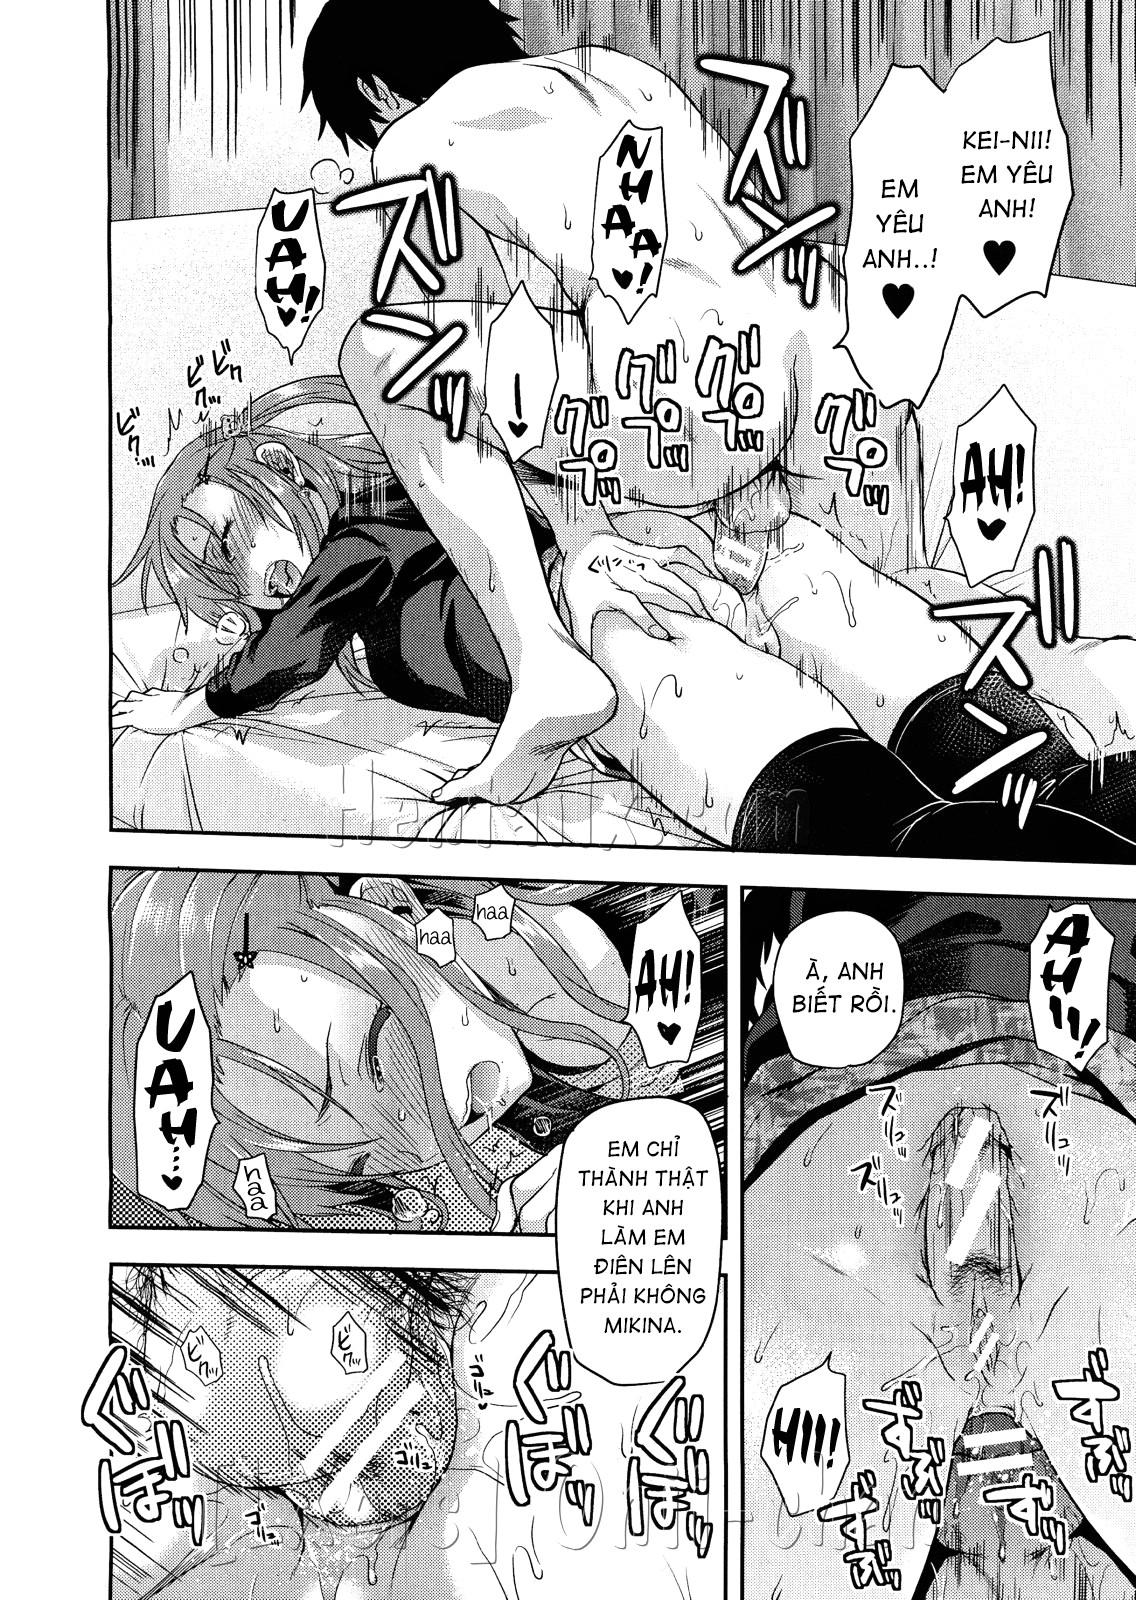 Truyện Hentai The Little Sisters Butt Belongs to Her Older Brother!!, đọc truyện hentai, truyện tranh sex mới nhất tại wap truyện tranh hentai sex tothichcau.org